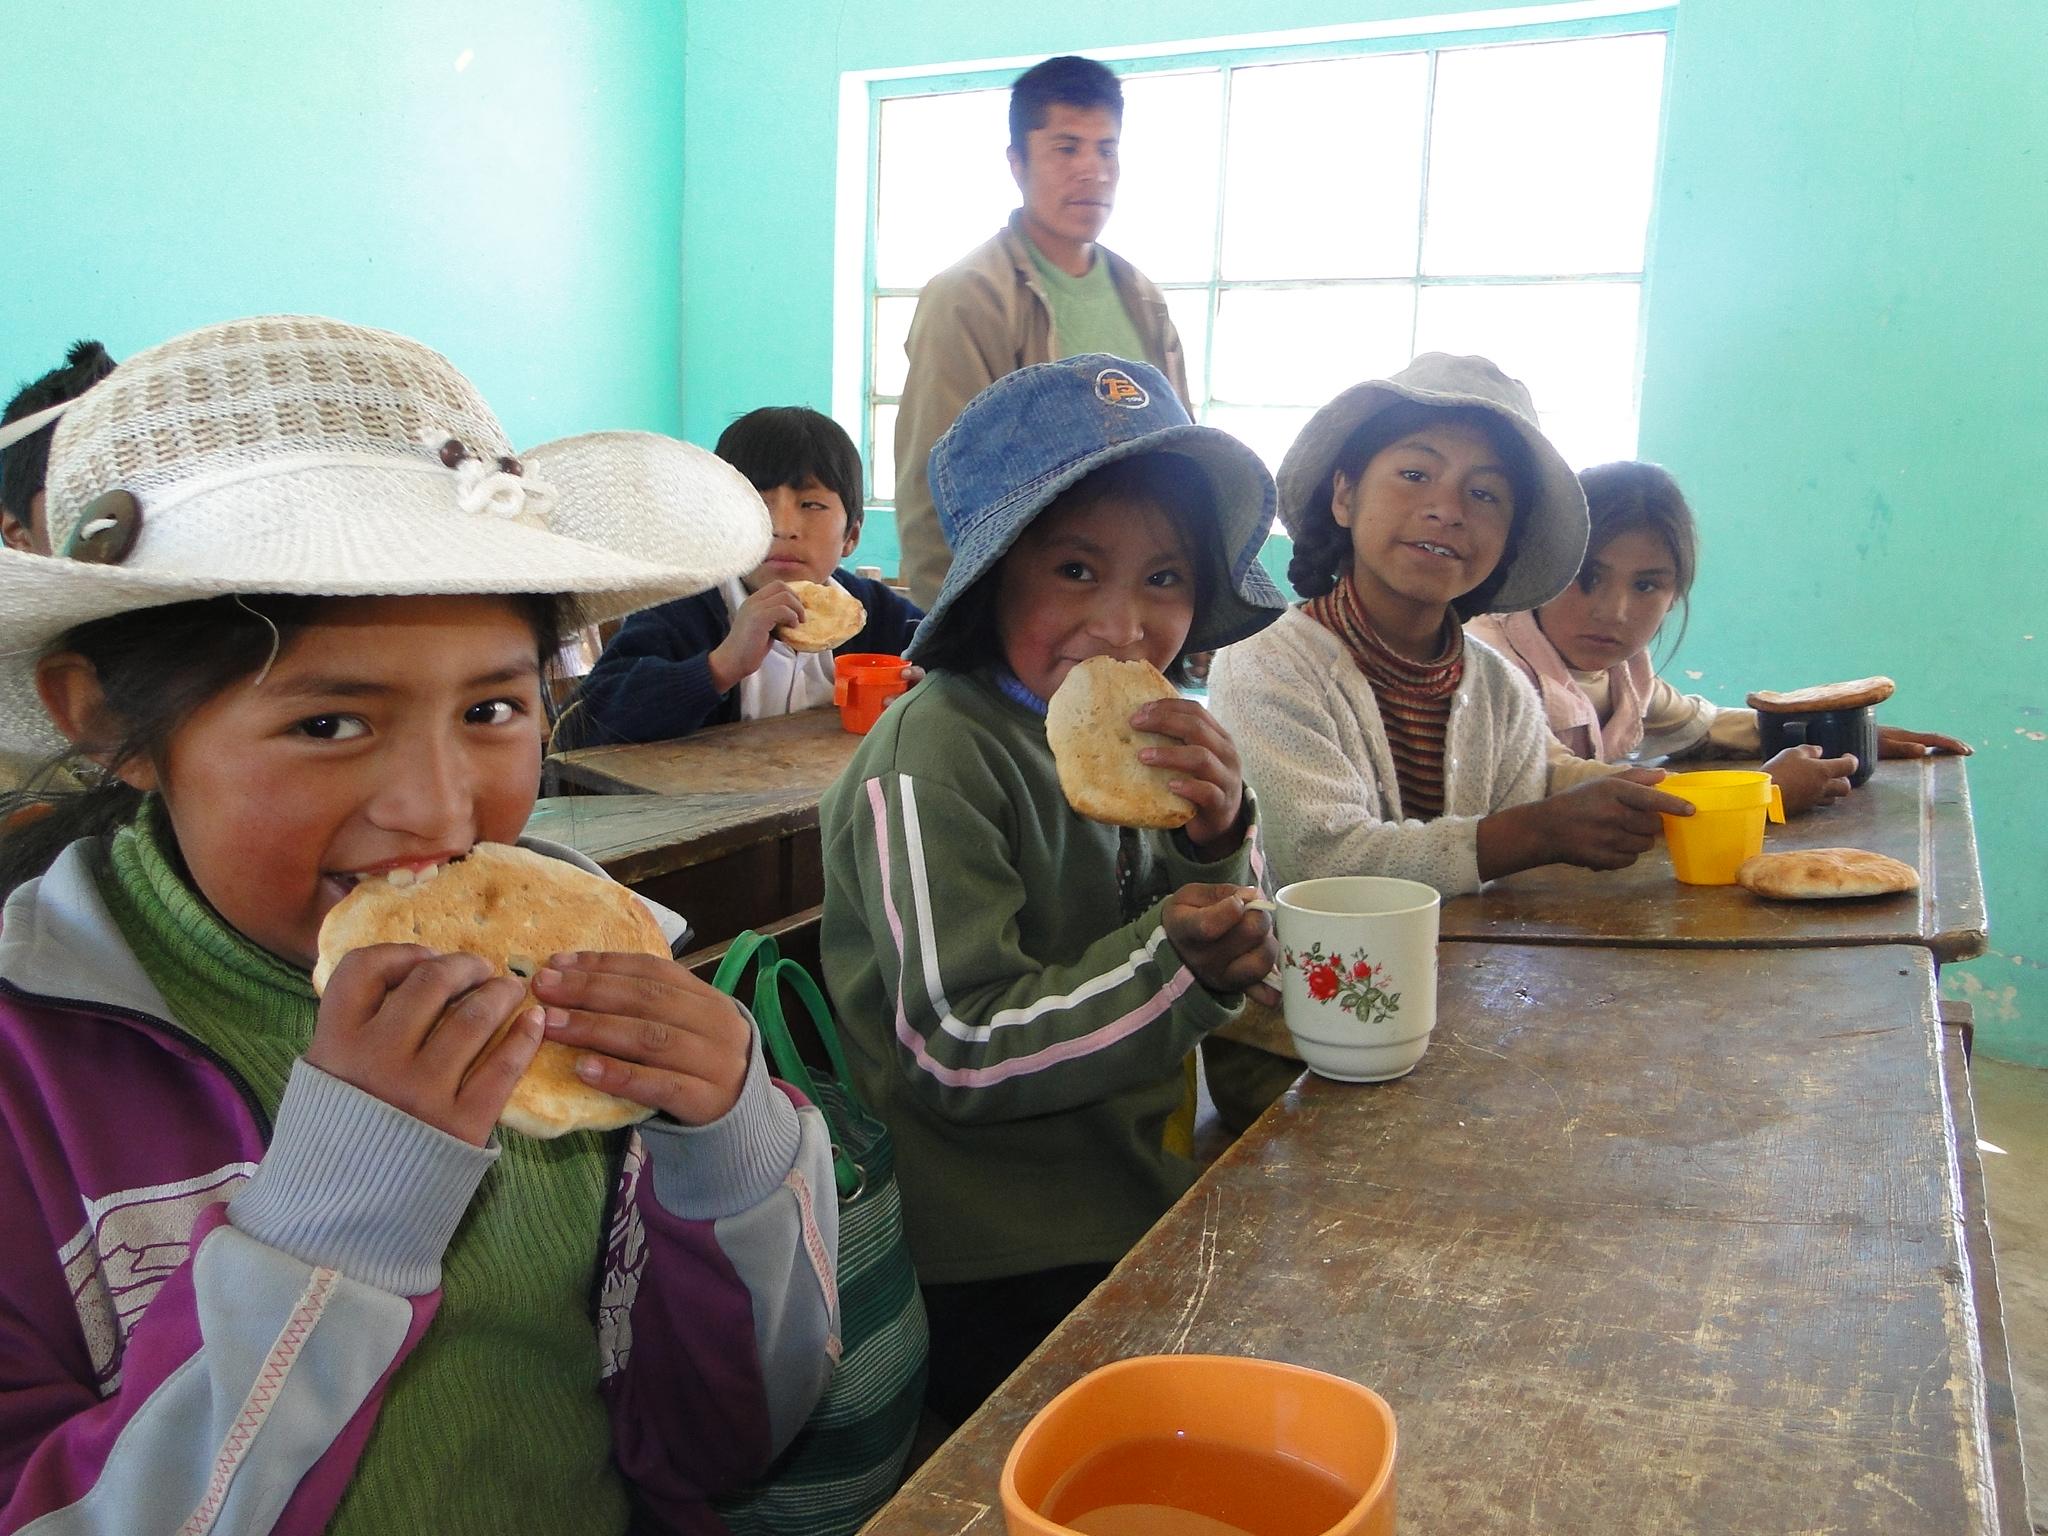 providing-nutrition-combatting-childhood-hunger-bolivia-partnership-truvia-world-food-programme